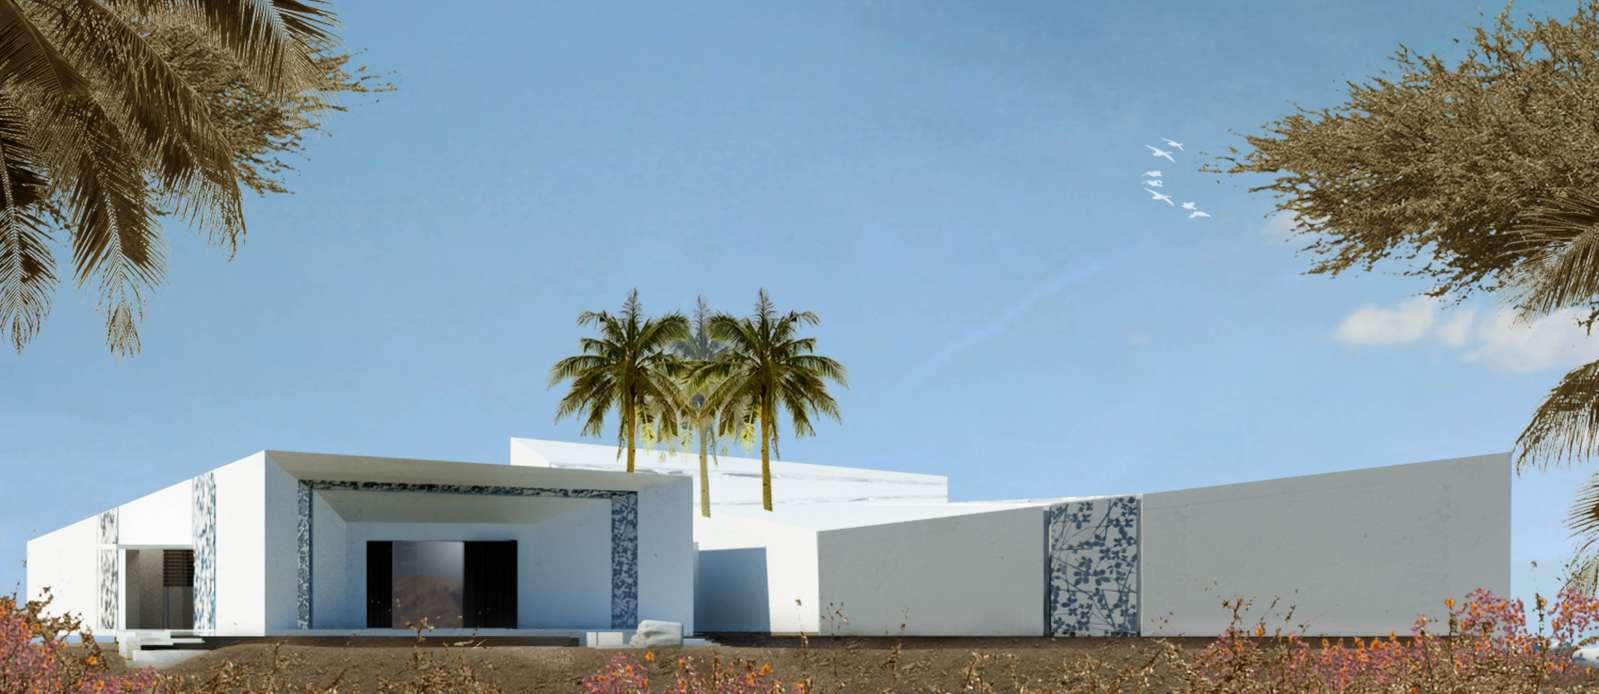 15-Alkhozama-Desert-Casa-de-Ark-Kassam-Arquitectos